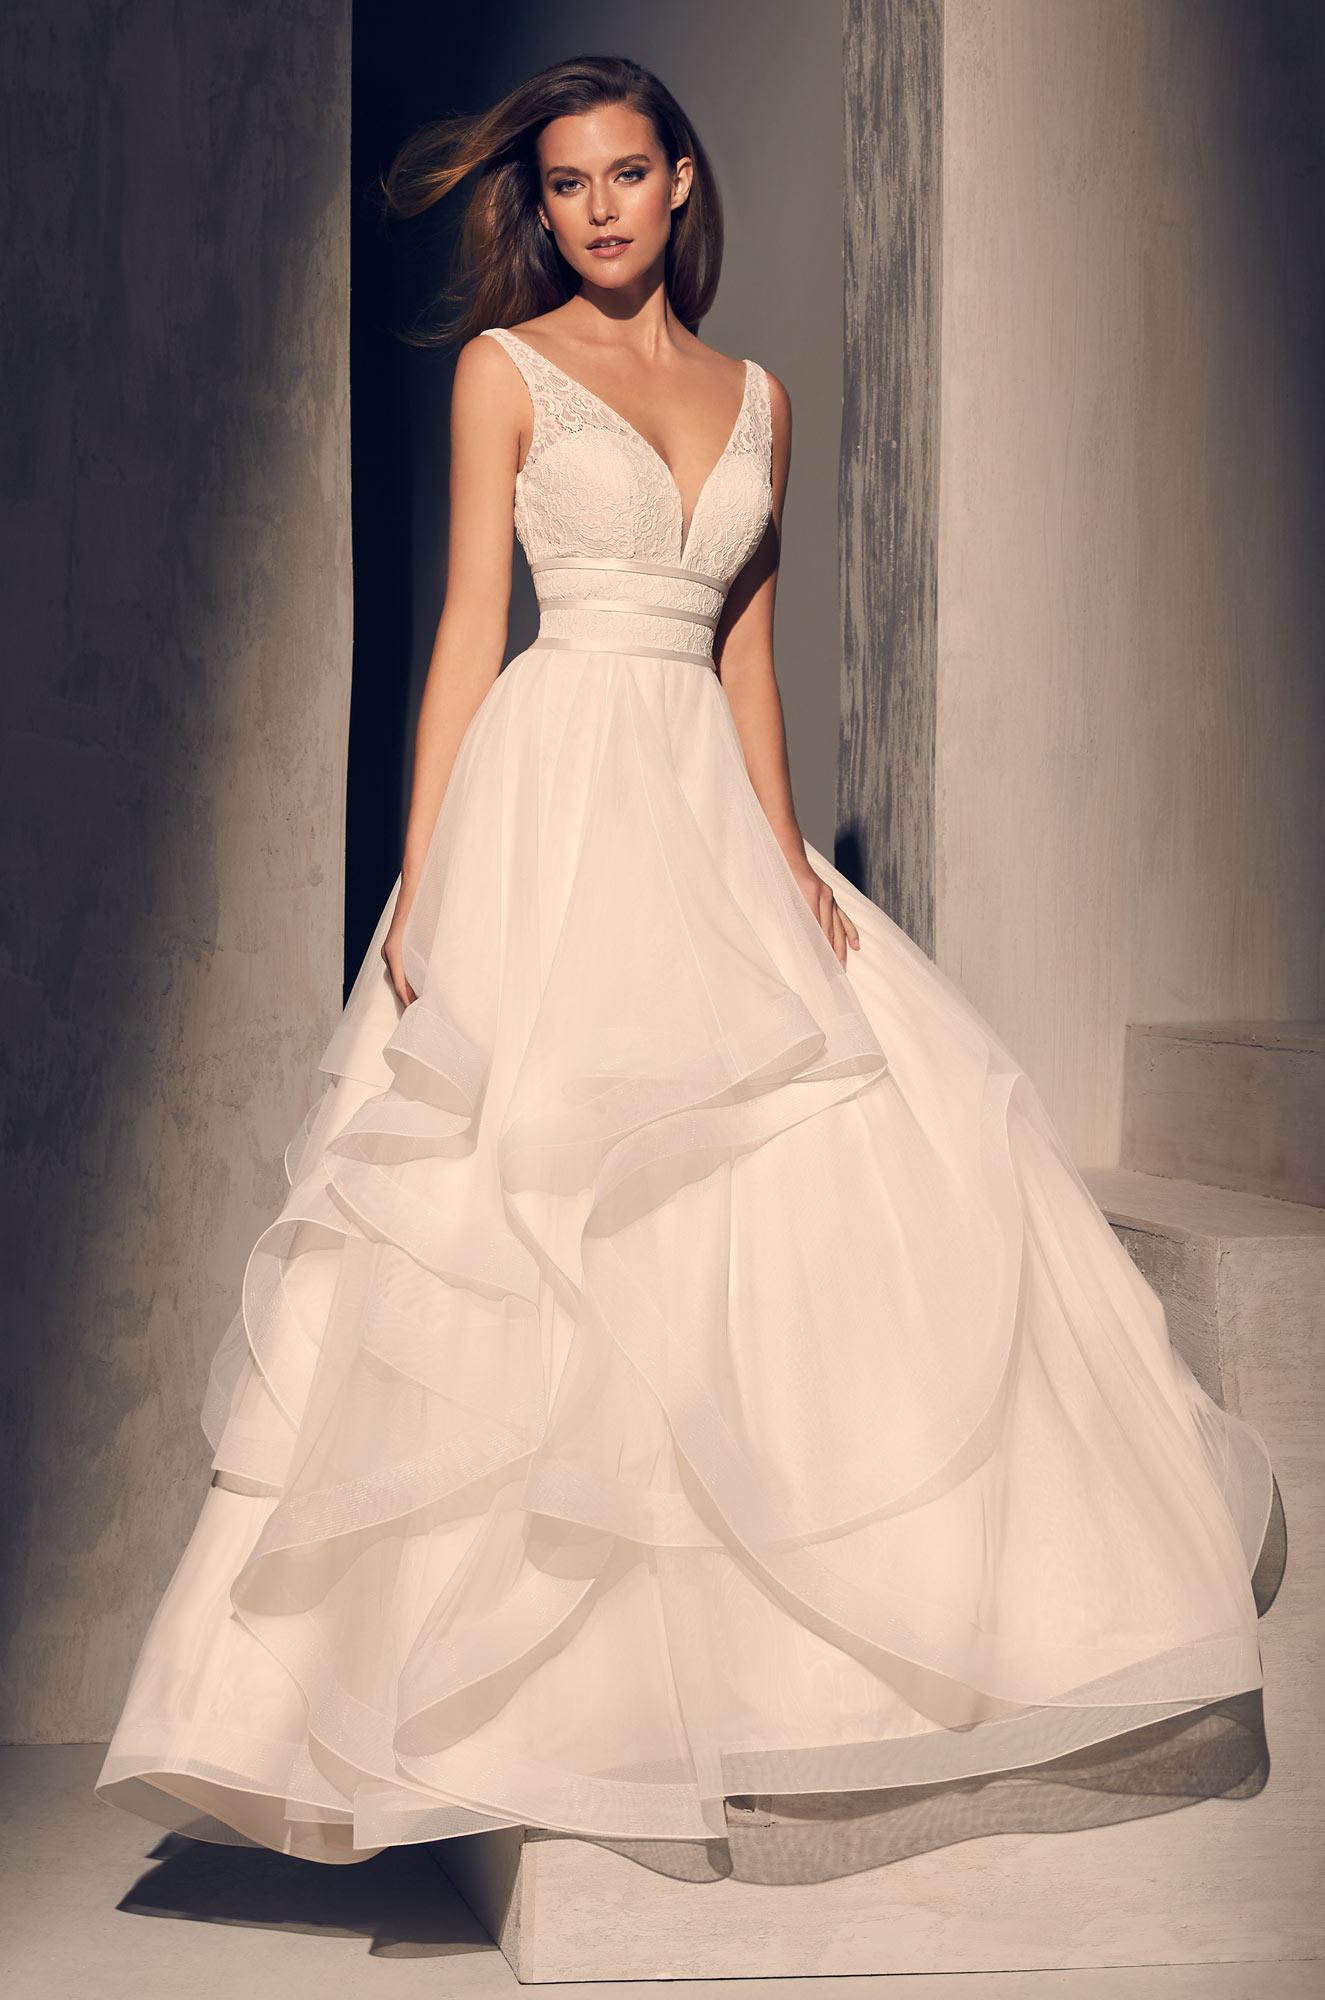 Textured V Neck Bodice Ruffle Skirt Ball Gown Wedding Dress Kleinfeld Bridal